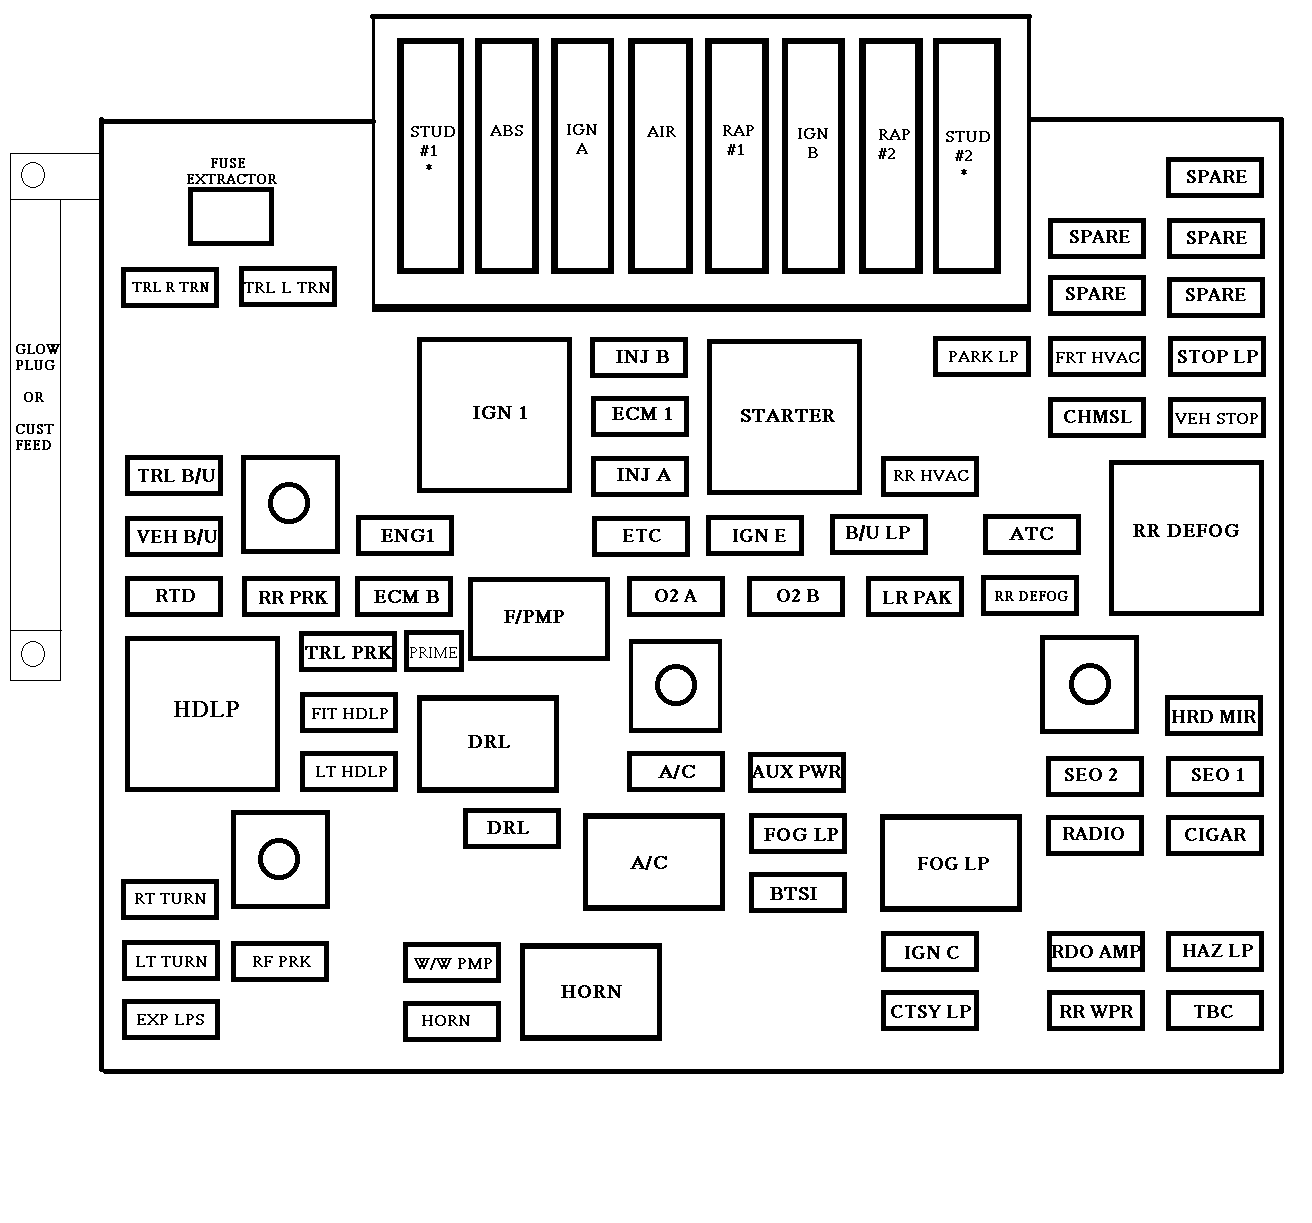 Alfa Romeo 147 Fuse Box Location - List of Wiring Diagrams on